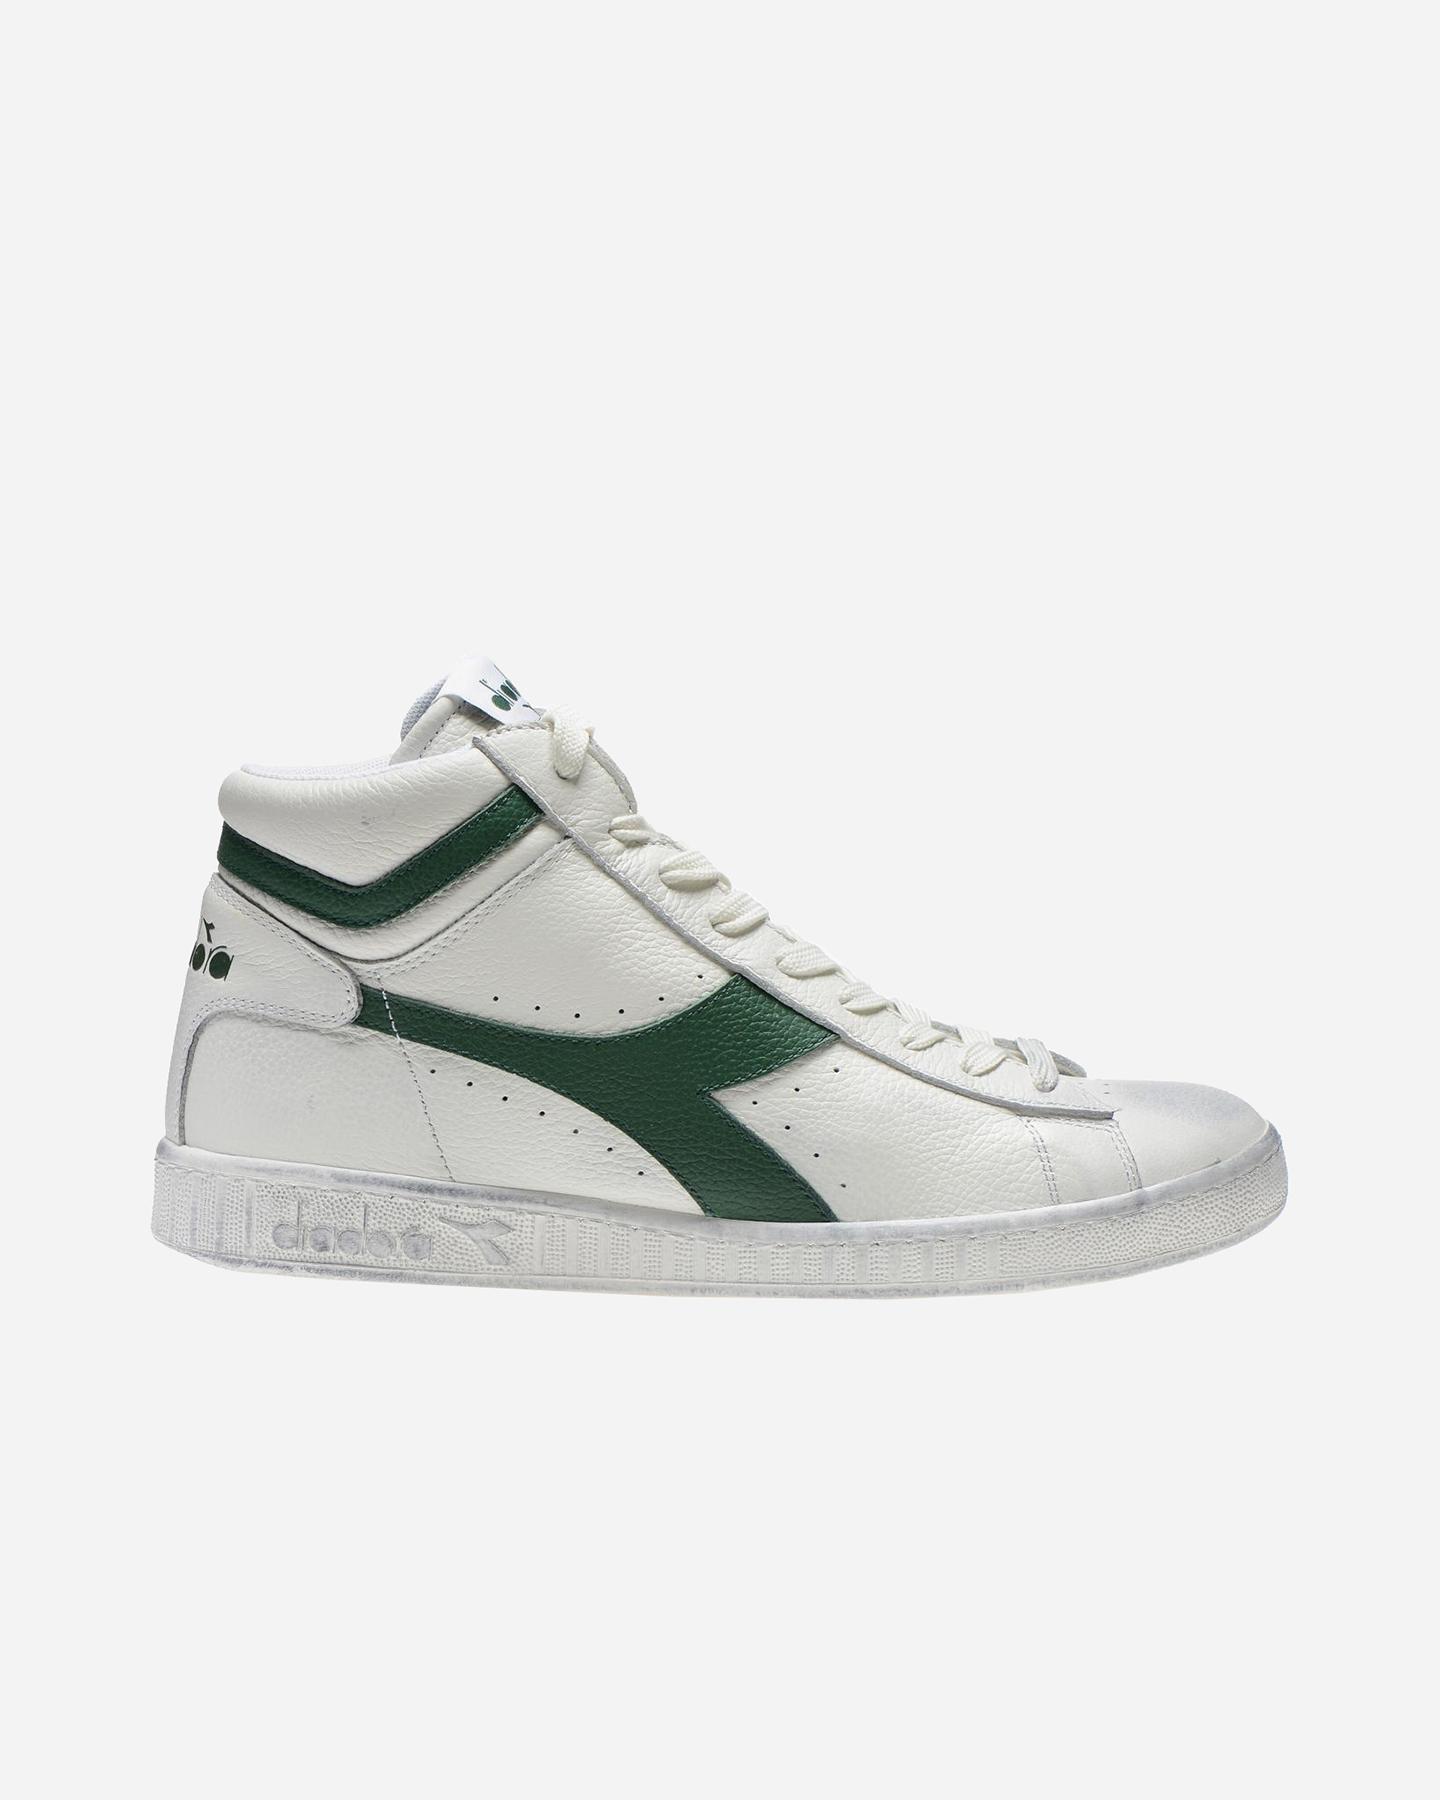 Scarpe C1161 L Game M Diadora Su High 159657 Waxed Sneakers dx0YUdw5q